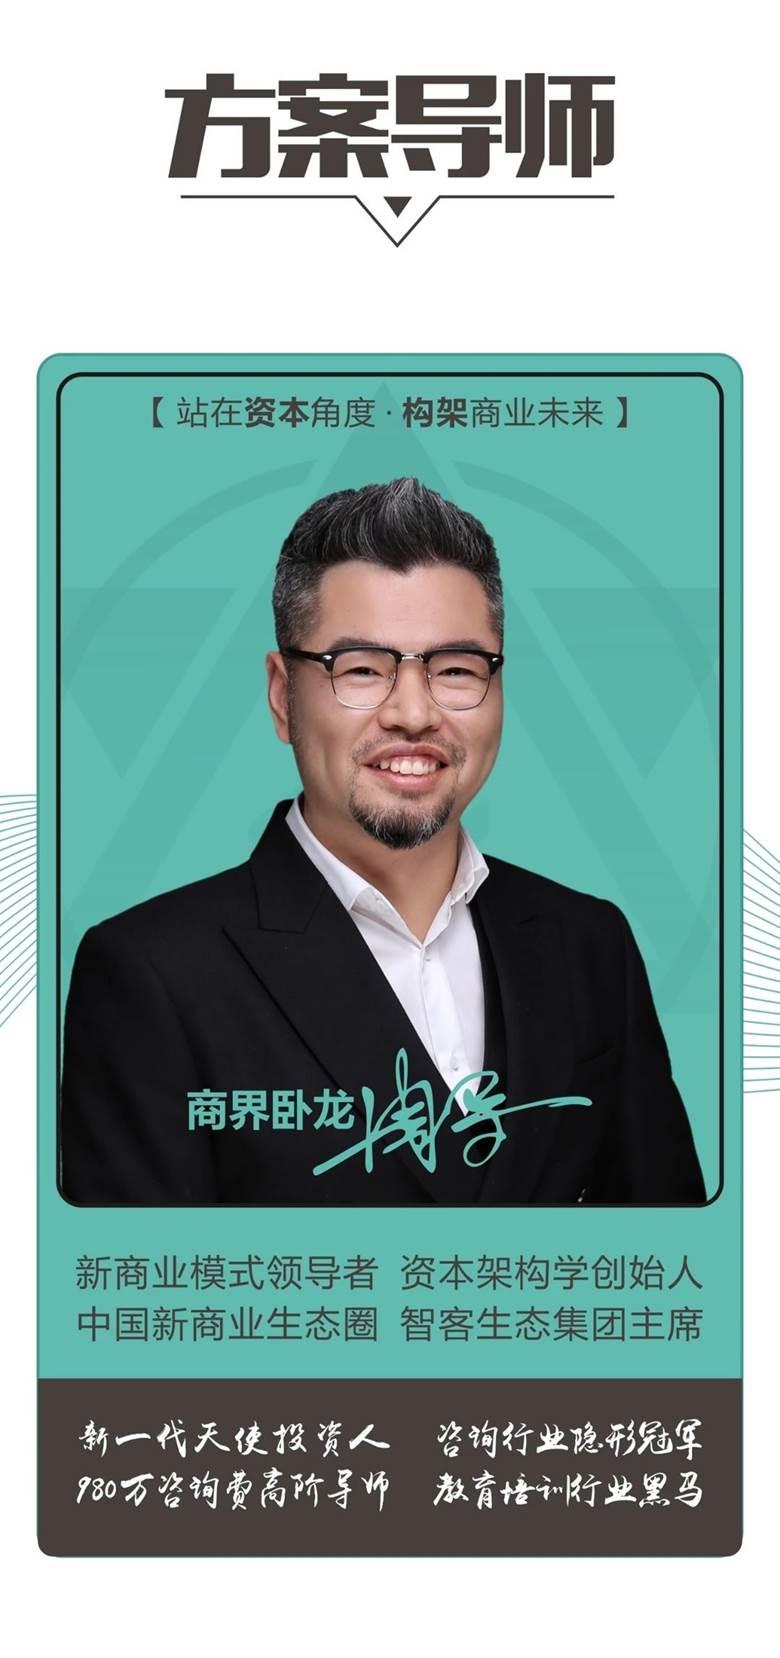 http://www.huodongxing.com/file/20191113/1063603644976/133659461447087.jpg